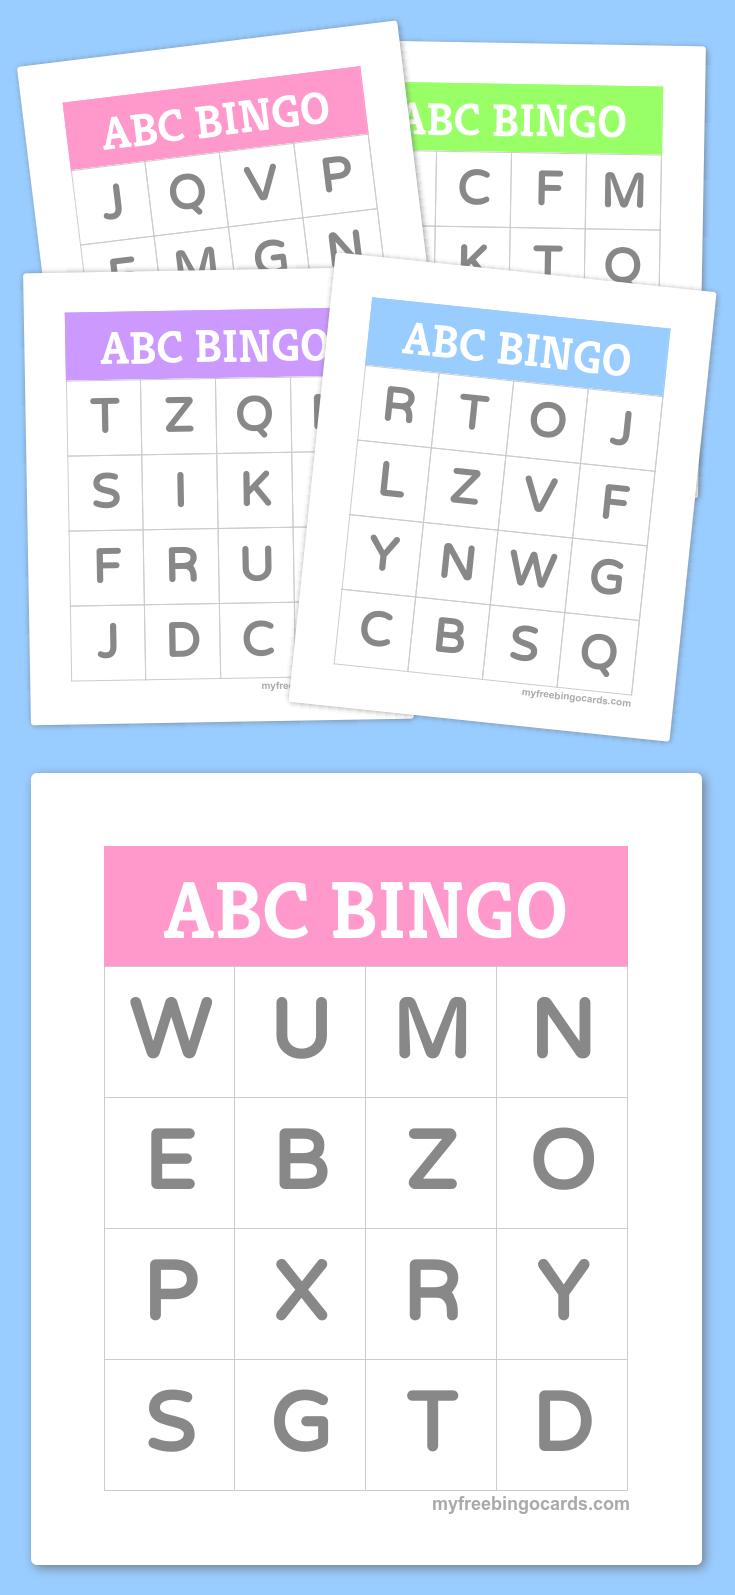 Free Printable Bingo Cards | Bingo Cards | Preschool Learning, Abc - Free Printable Number Bingo Cards 1 20